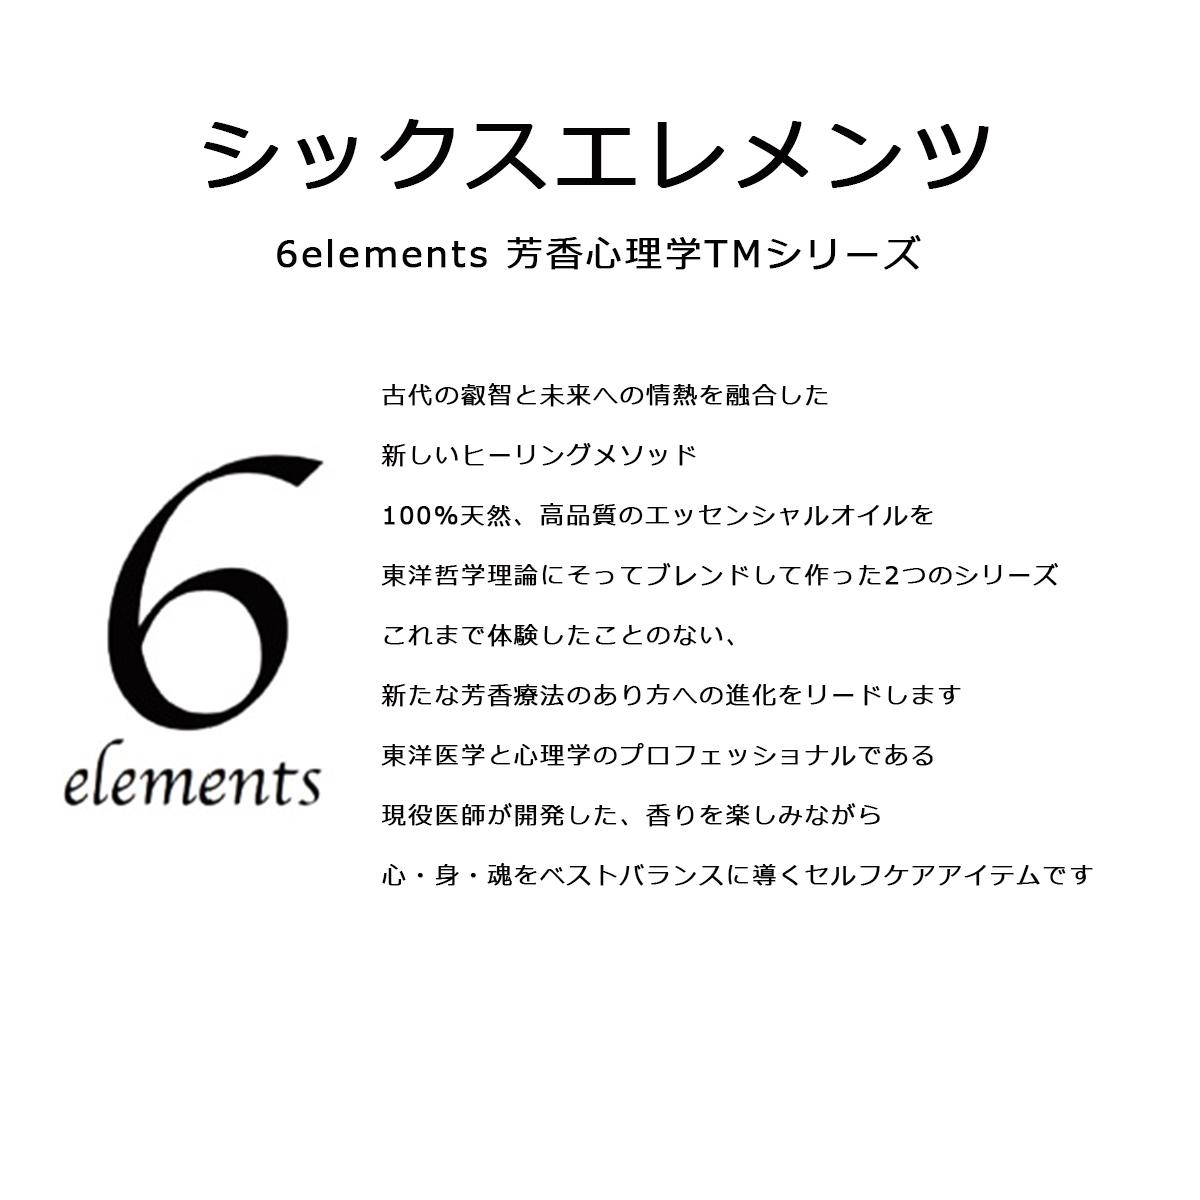 6elements Japan 六行ROKUGYO 木MOKU 2mL 【 翌日配達 送料無料 】 【 アロマ アロマテラピー 天然成分 高品質 エッセンシャルオイル  】